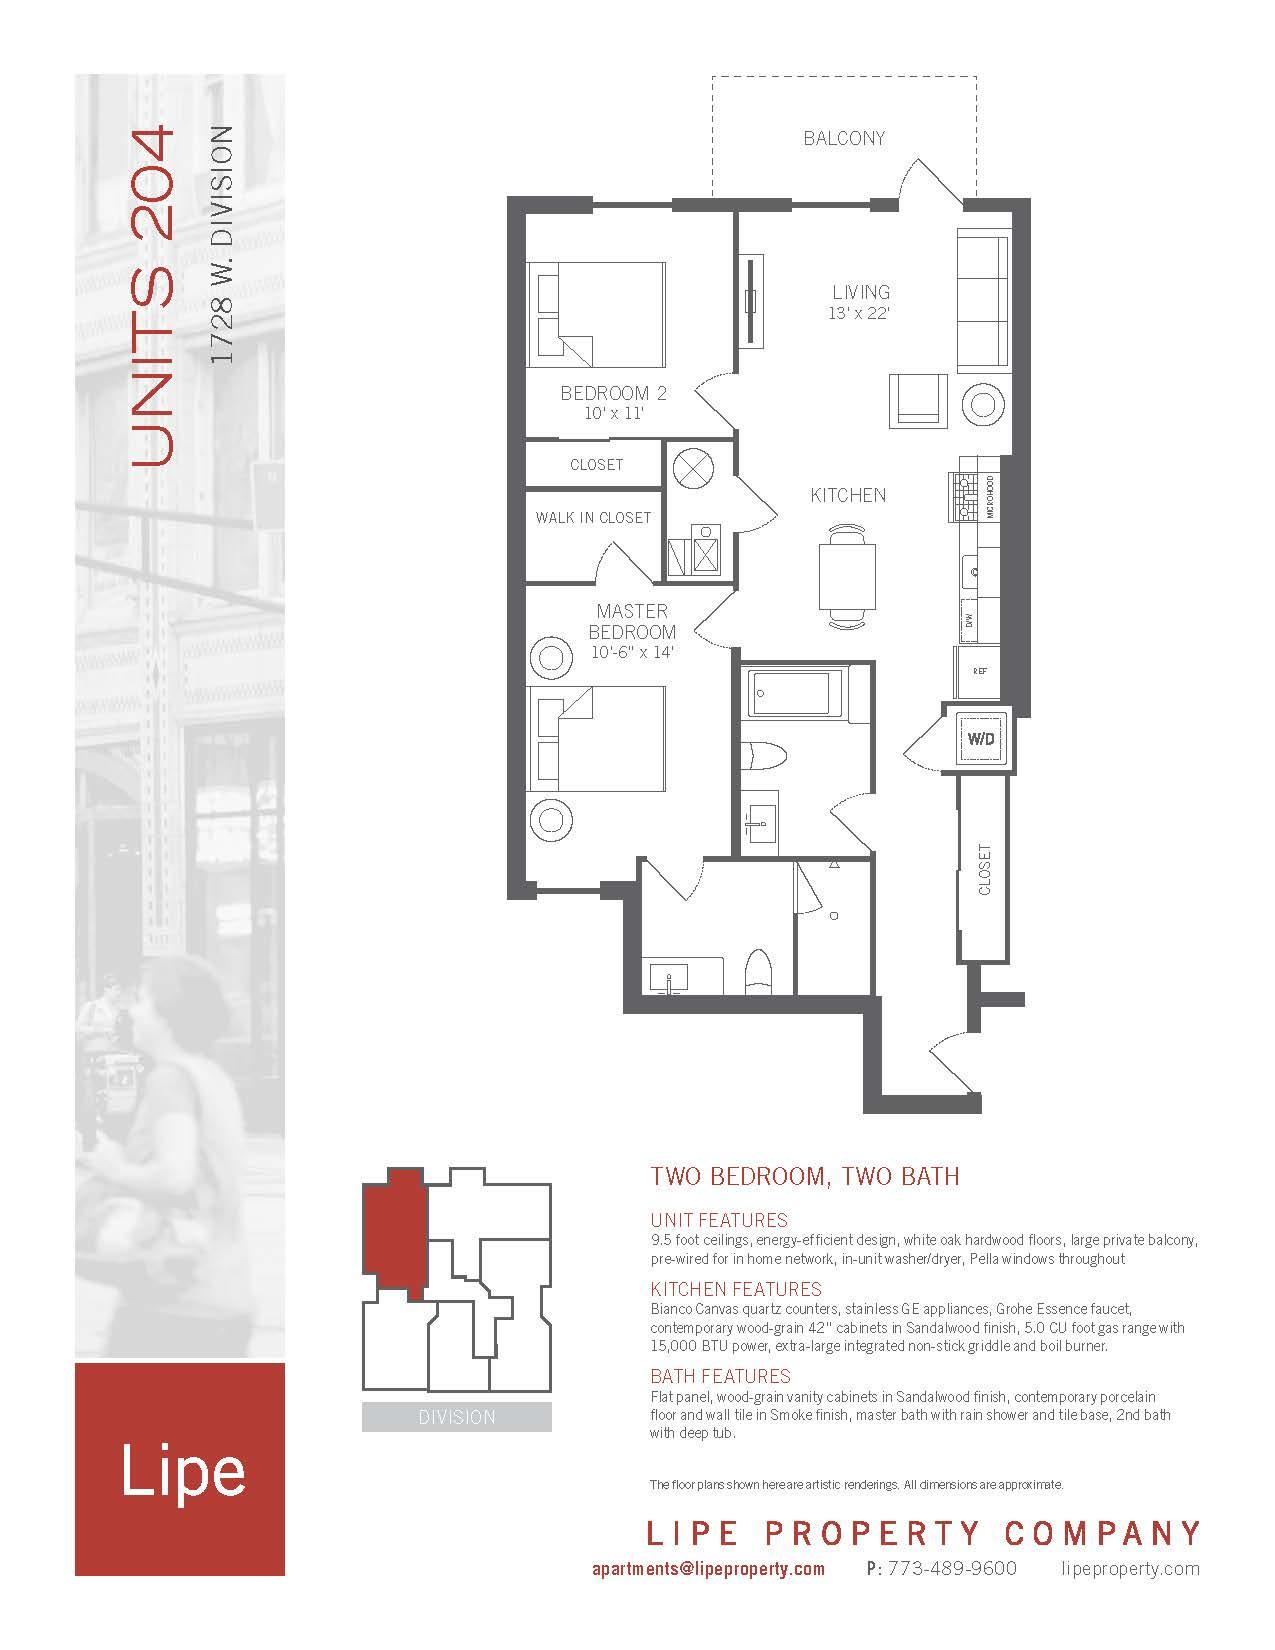 1728-West-Division-204-Floorplan-Chicago-apartment-for-rent.jpg